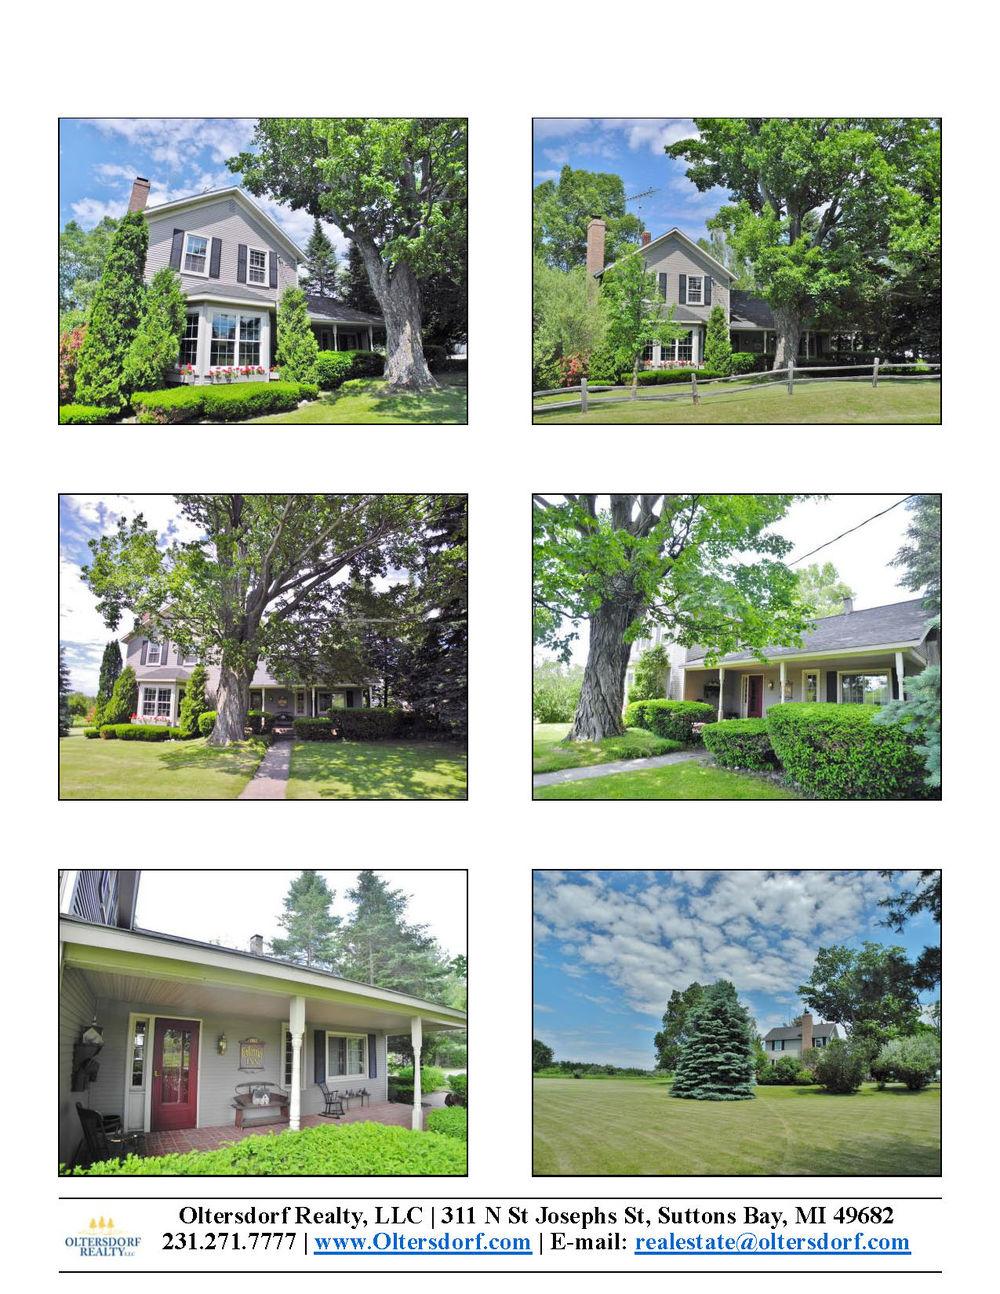 7251 E Alpers Road, Lake Leelanau, MI – Historic 1865 Centennial Inn For Sale By Oltersdorf Realty LLC Information Packet (2).jpg